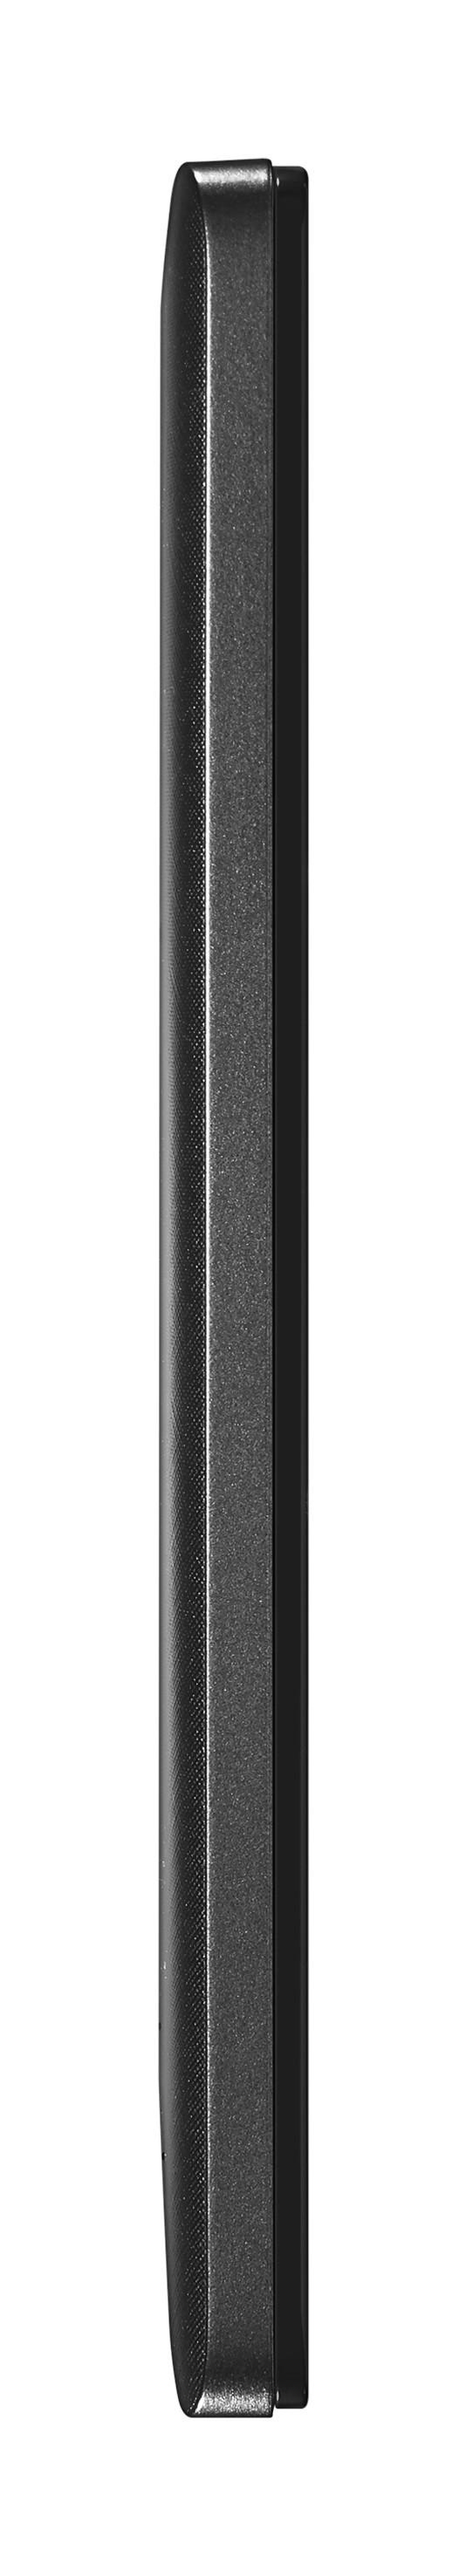 Lenovo A6010 Plus